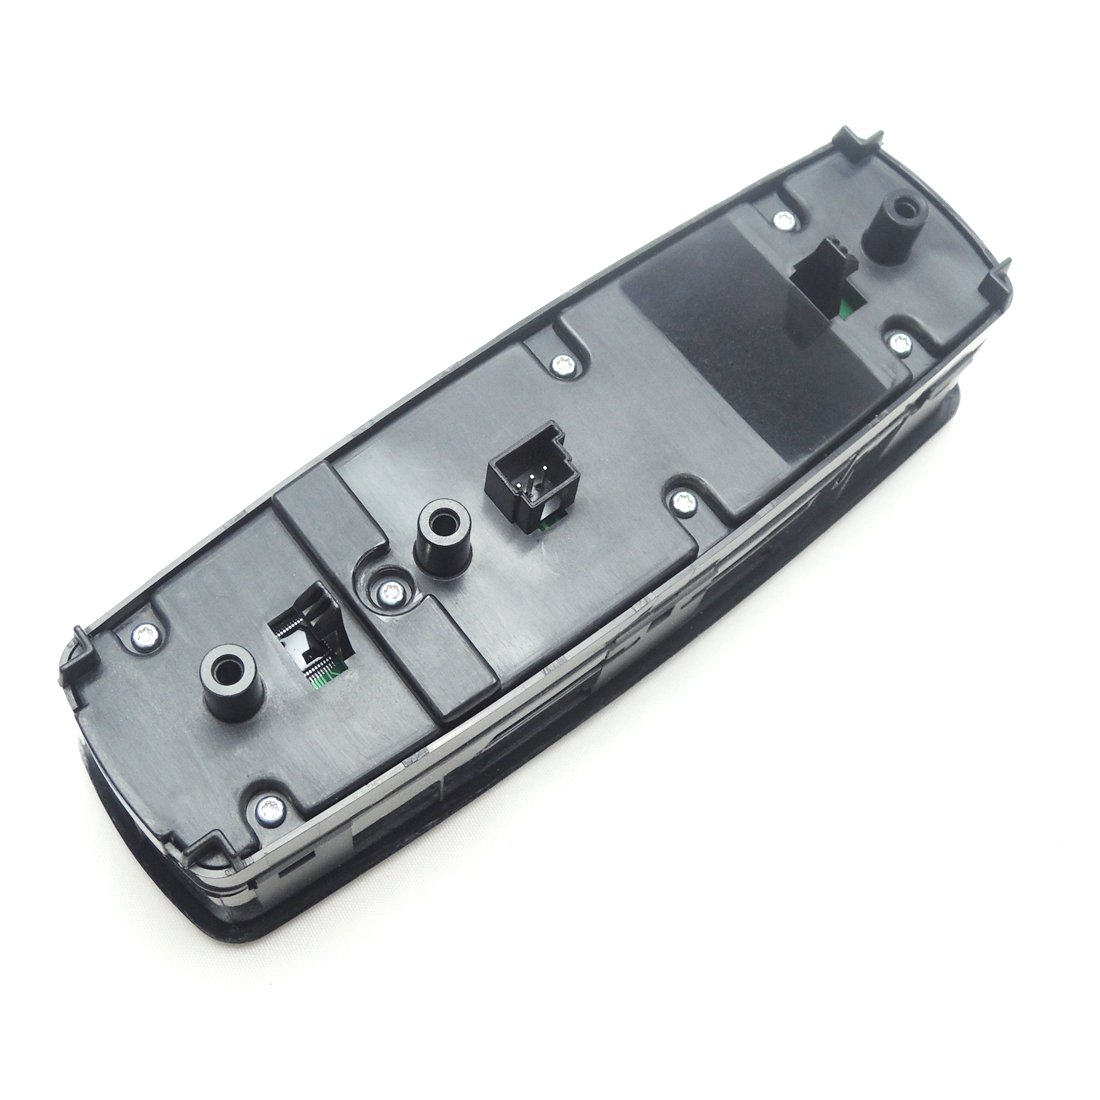 Mercedes-Benz ML GL R Class Power Window Switch 2518300290-9051